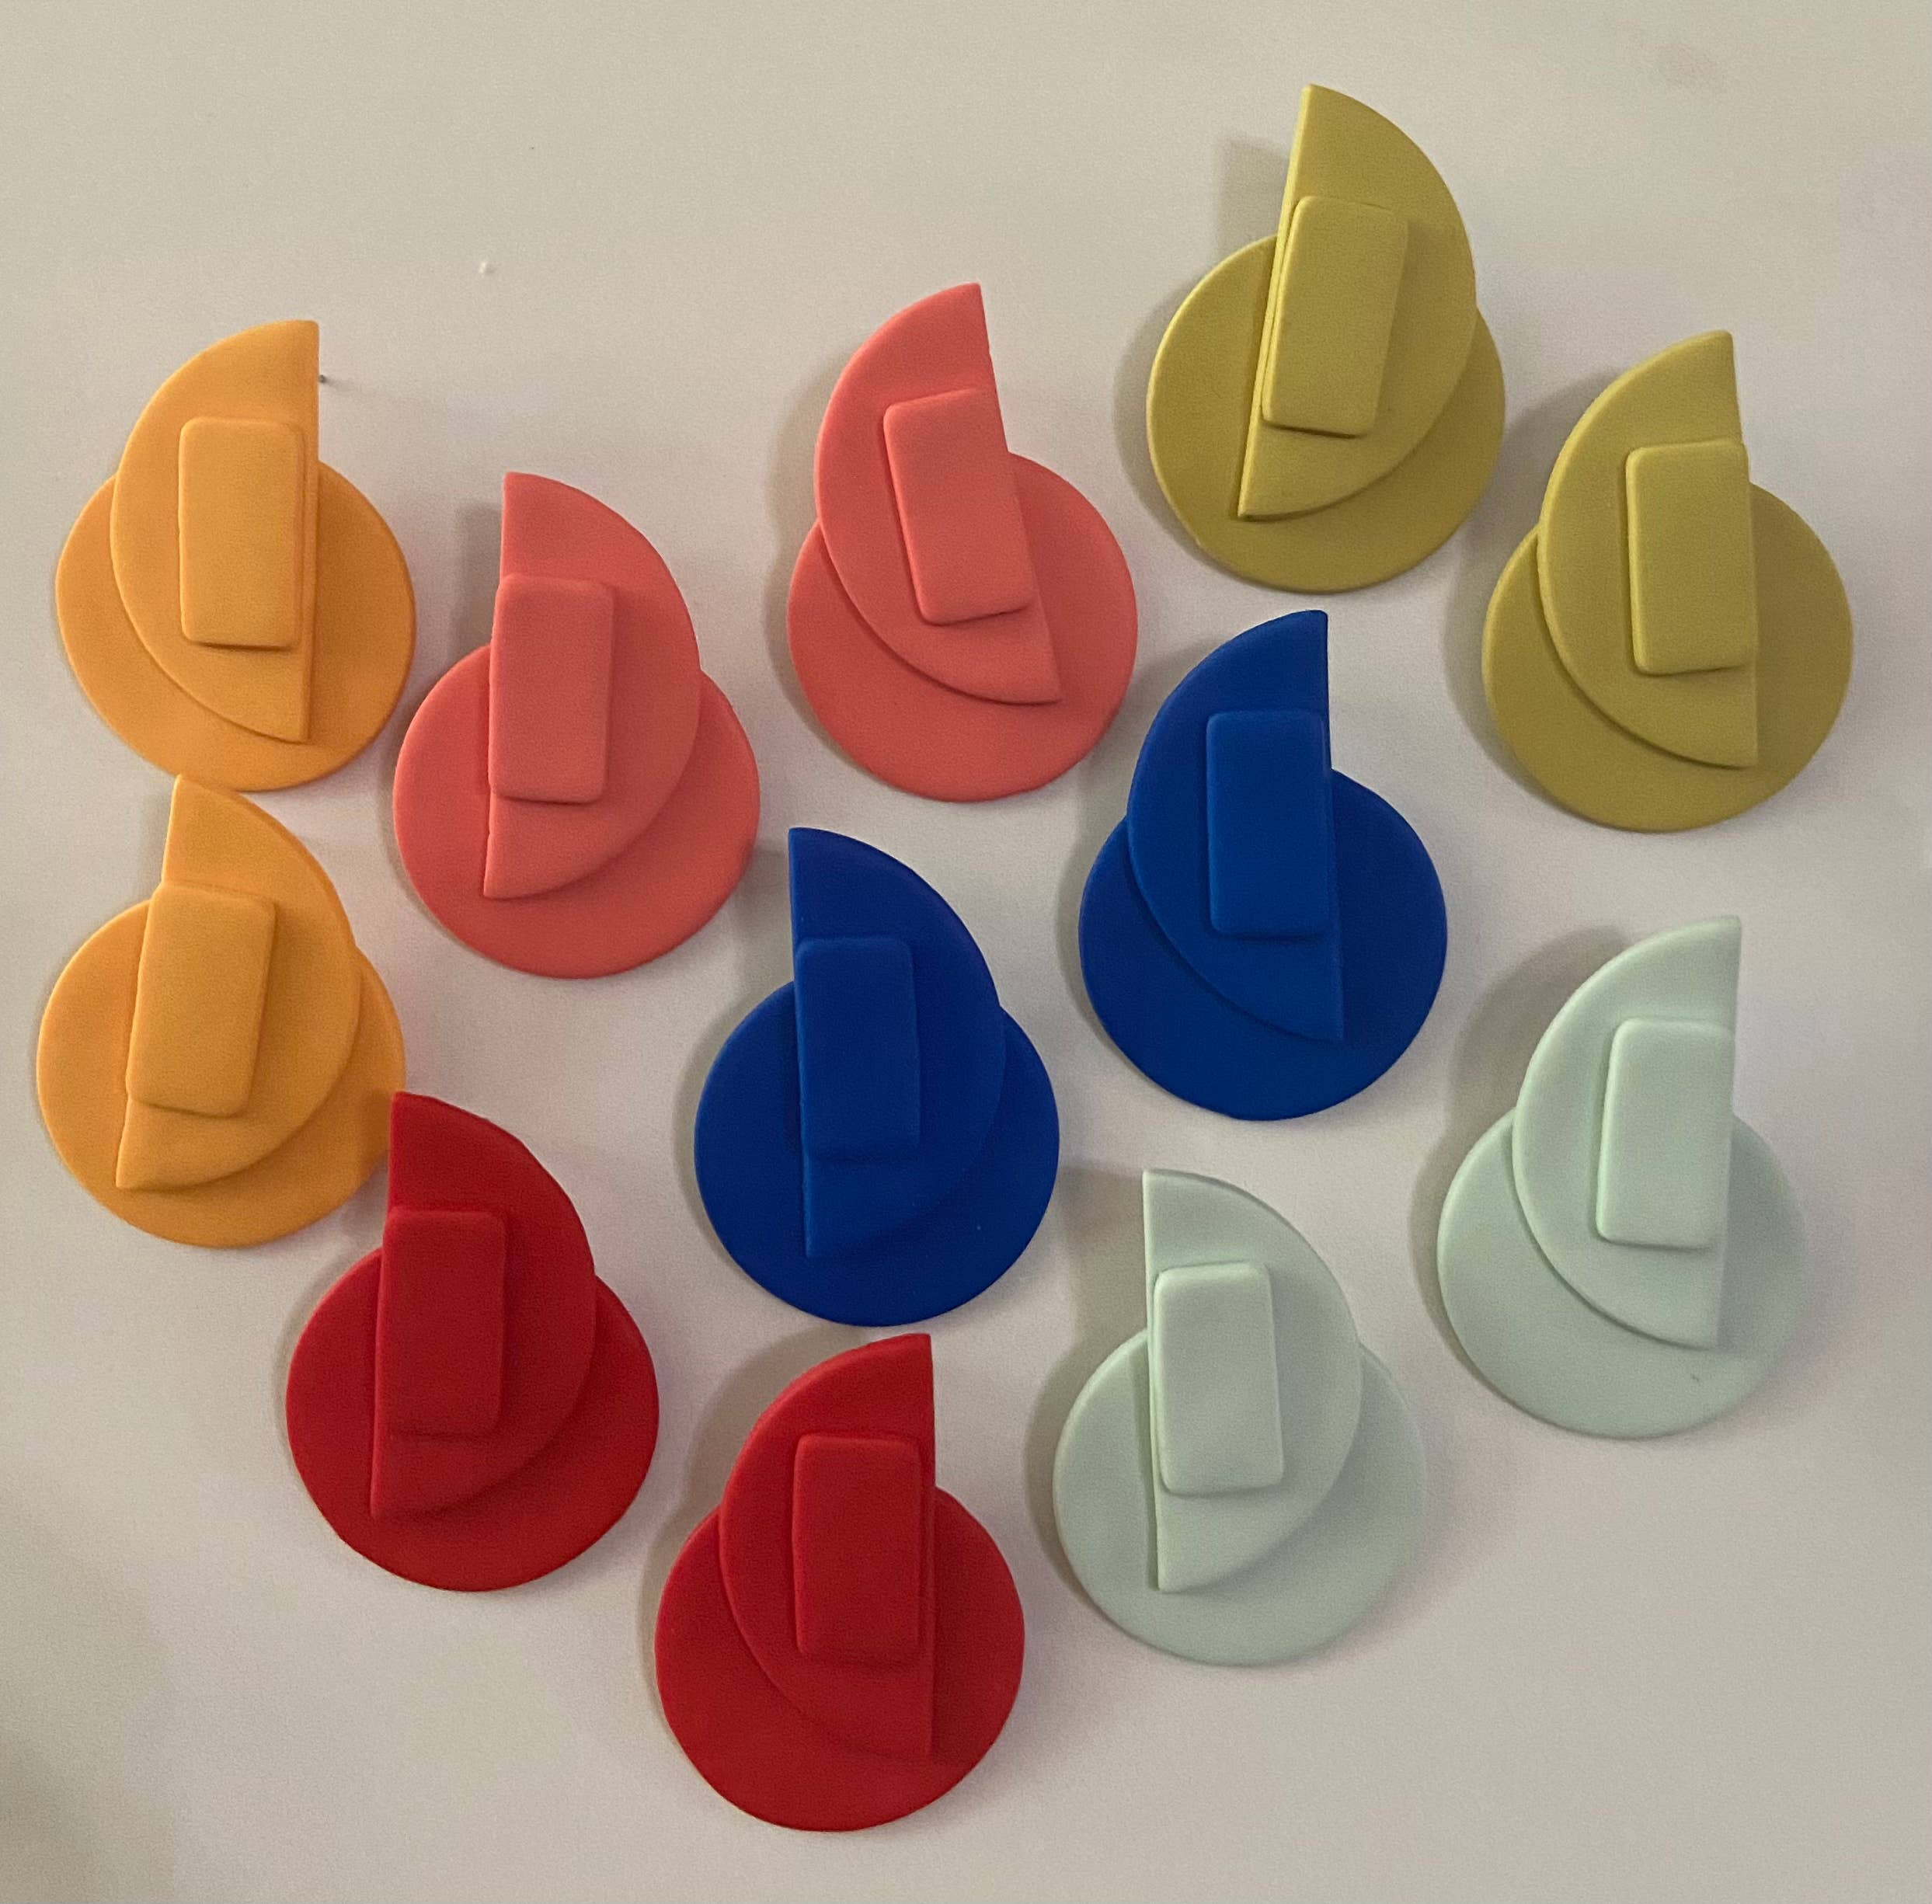 Geometric Clay Studs | Trada Marketplace